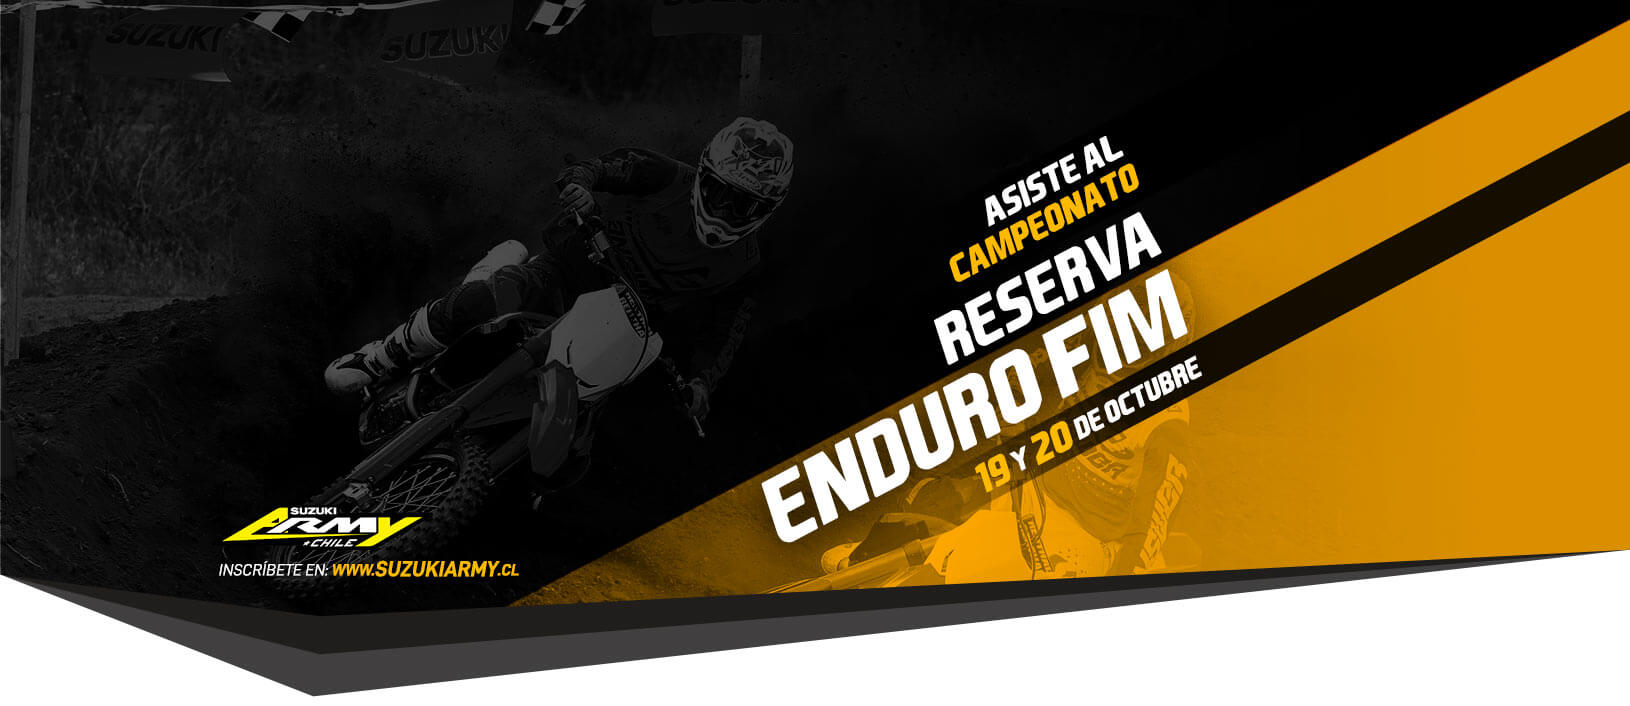 Reserva Enduro Fim 19 y 20 de Oct